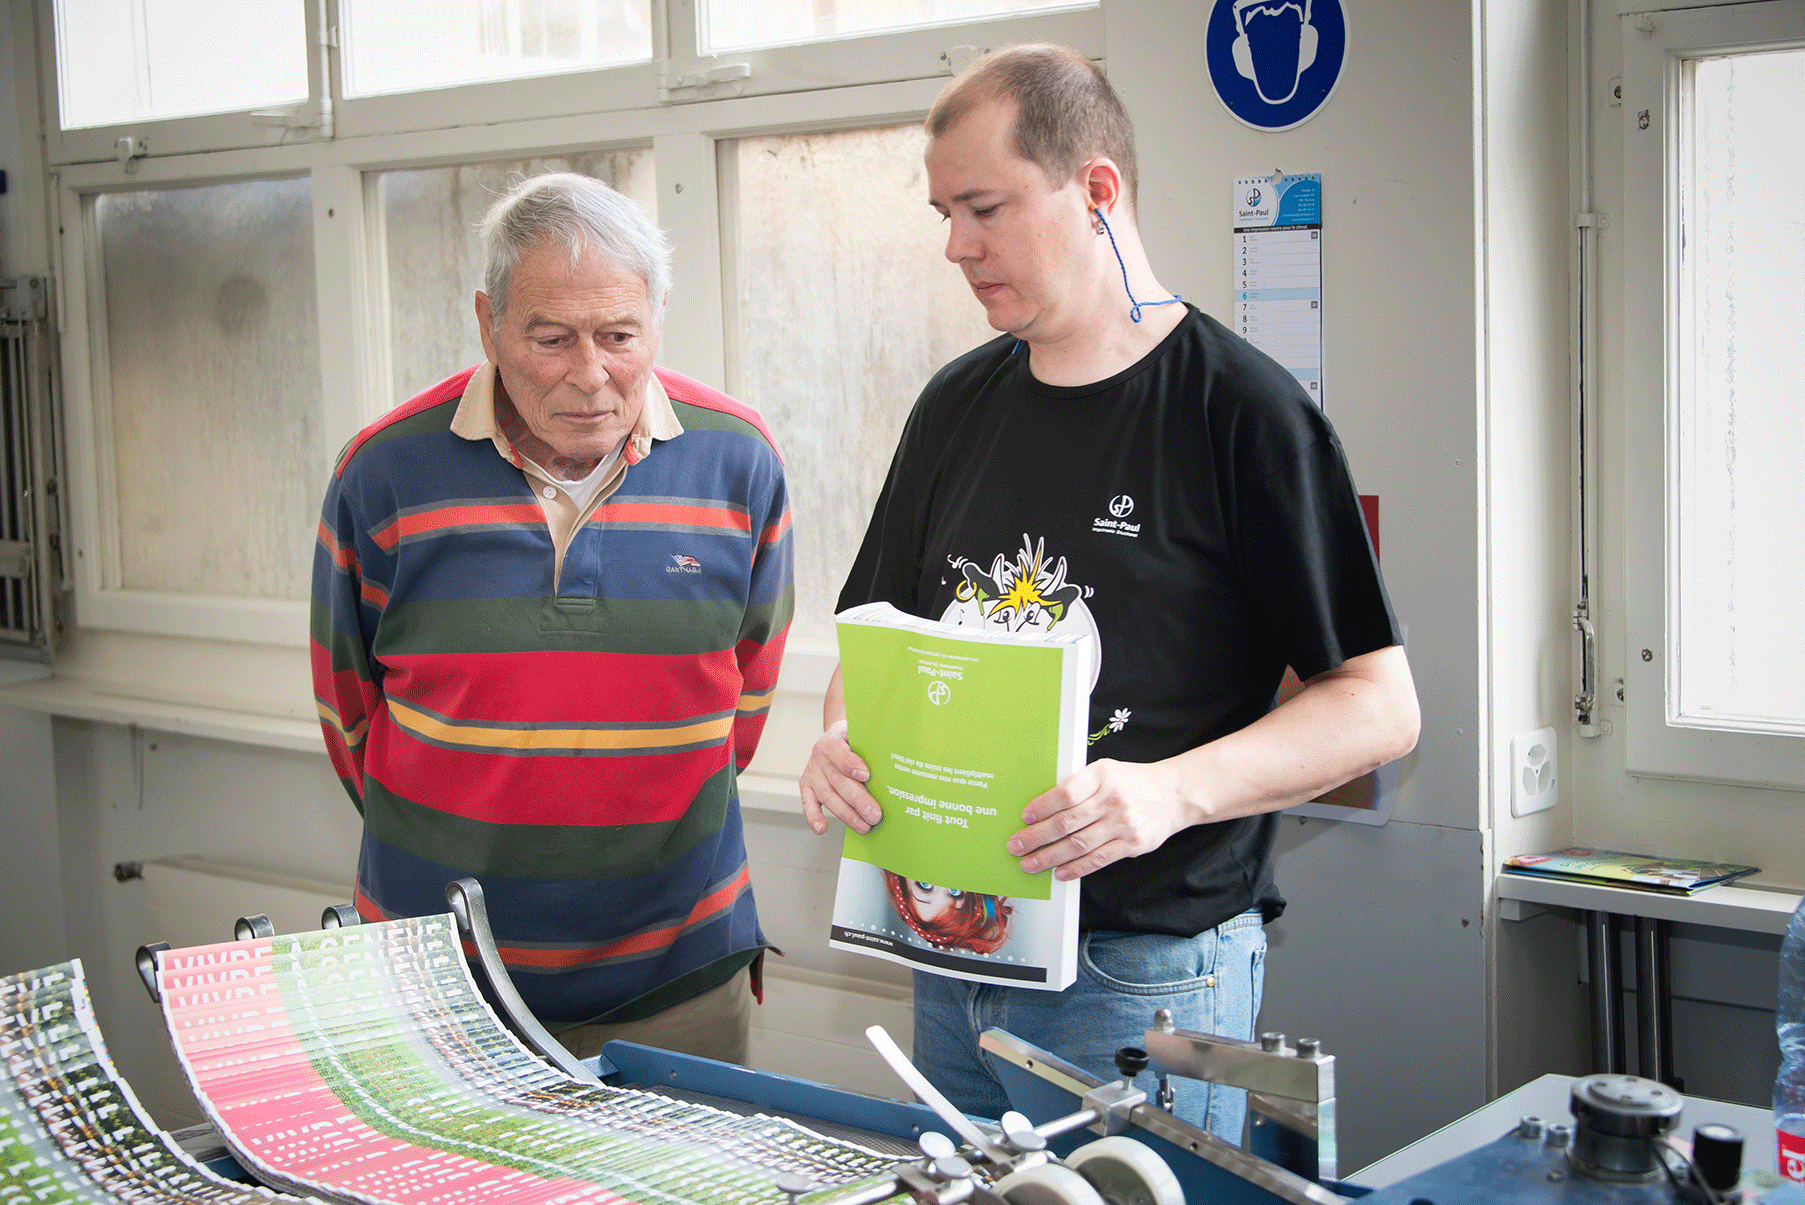 Clients et partenaires. Kunden und Partner. 11.09.2015